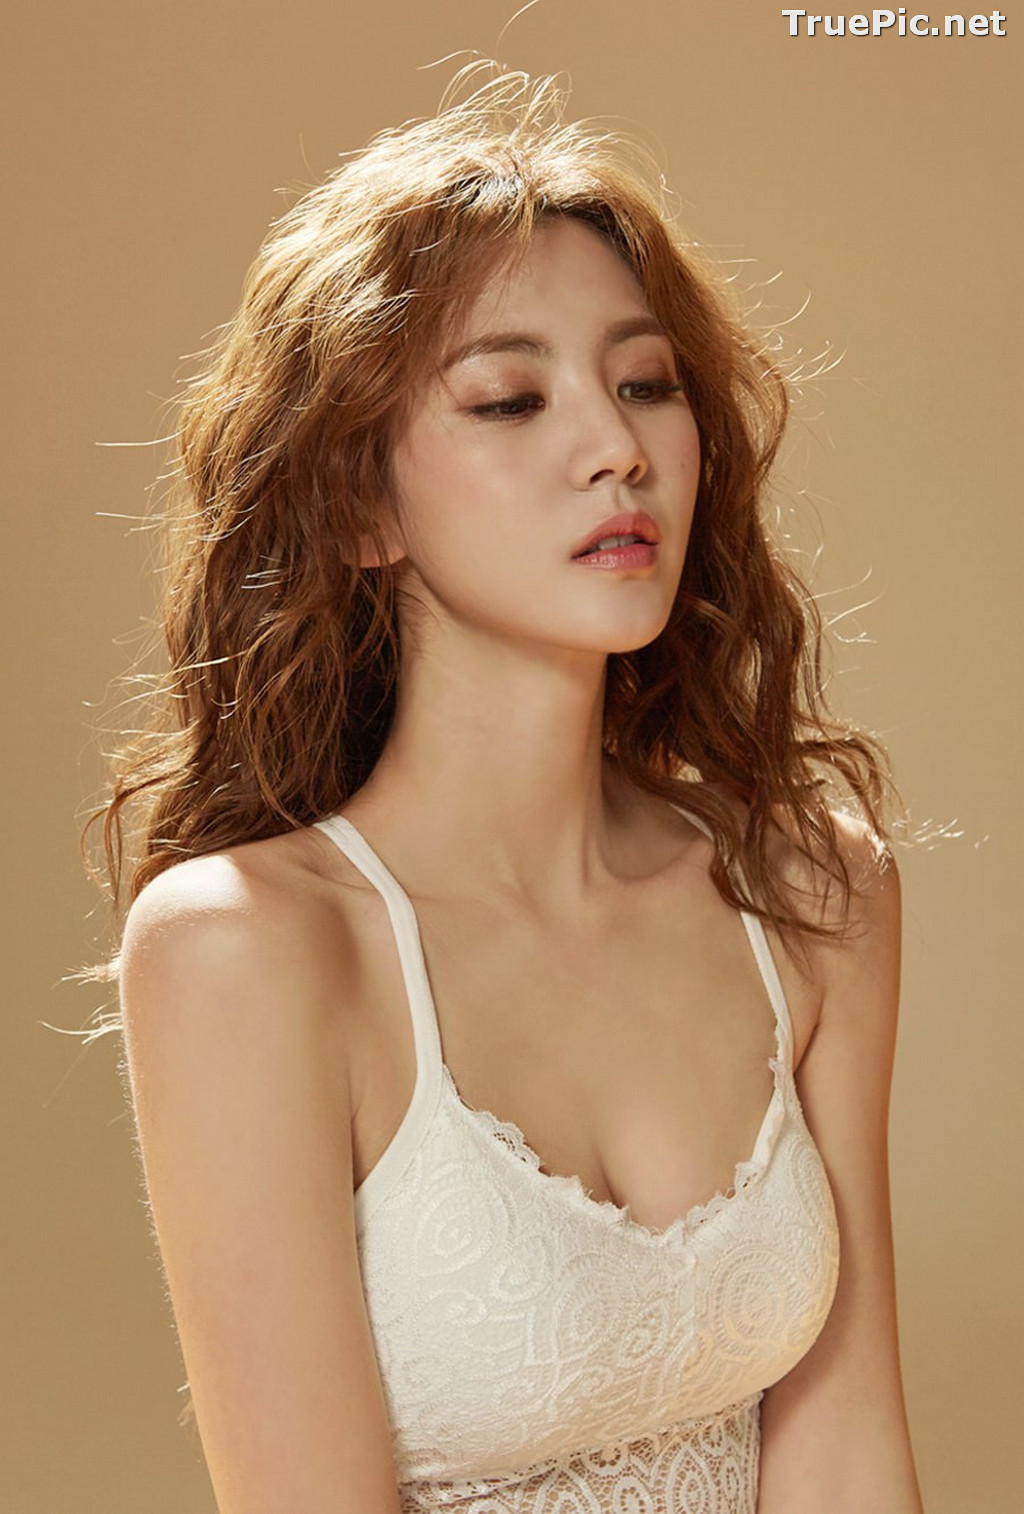 Image Korean Fashion Model – Lee Chae Eun (이채은) – Come On Vincent Lingerie #7 - TruePic.net - Picture-3